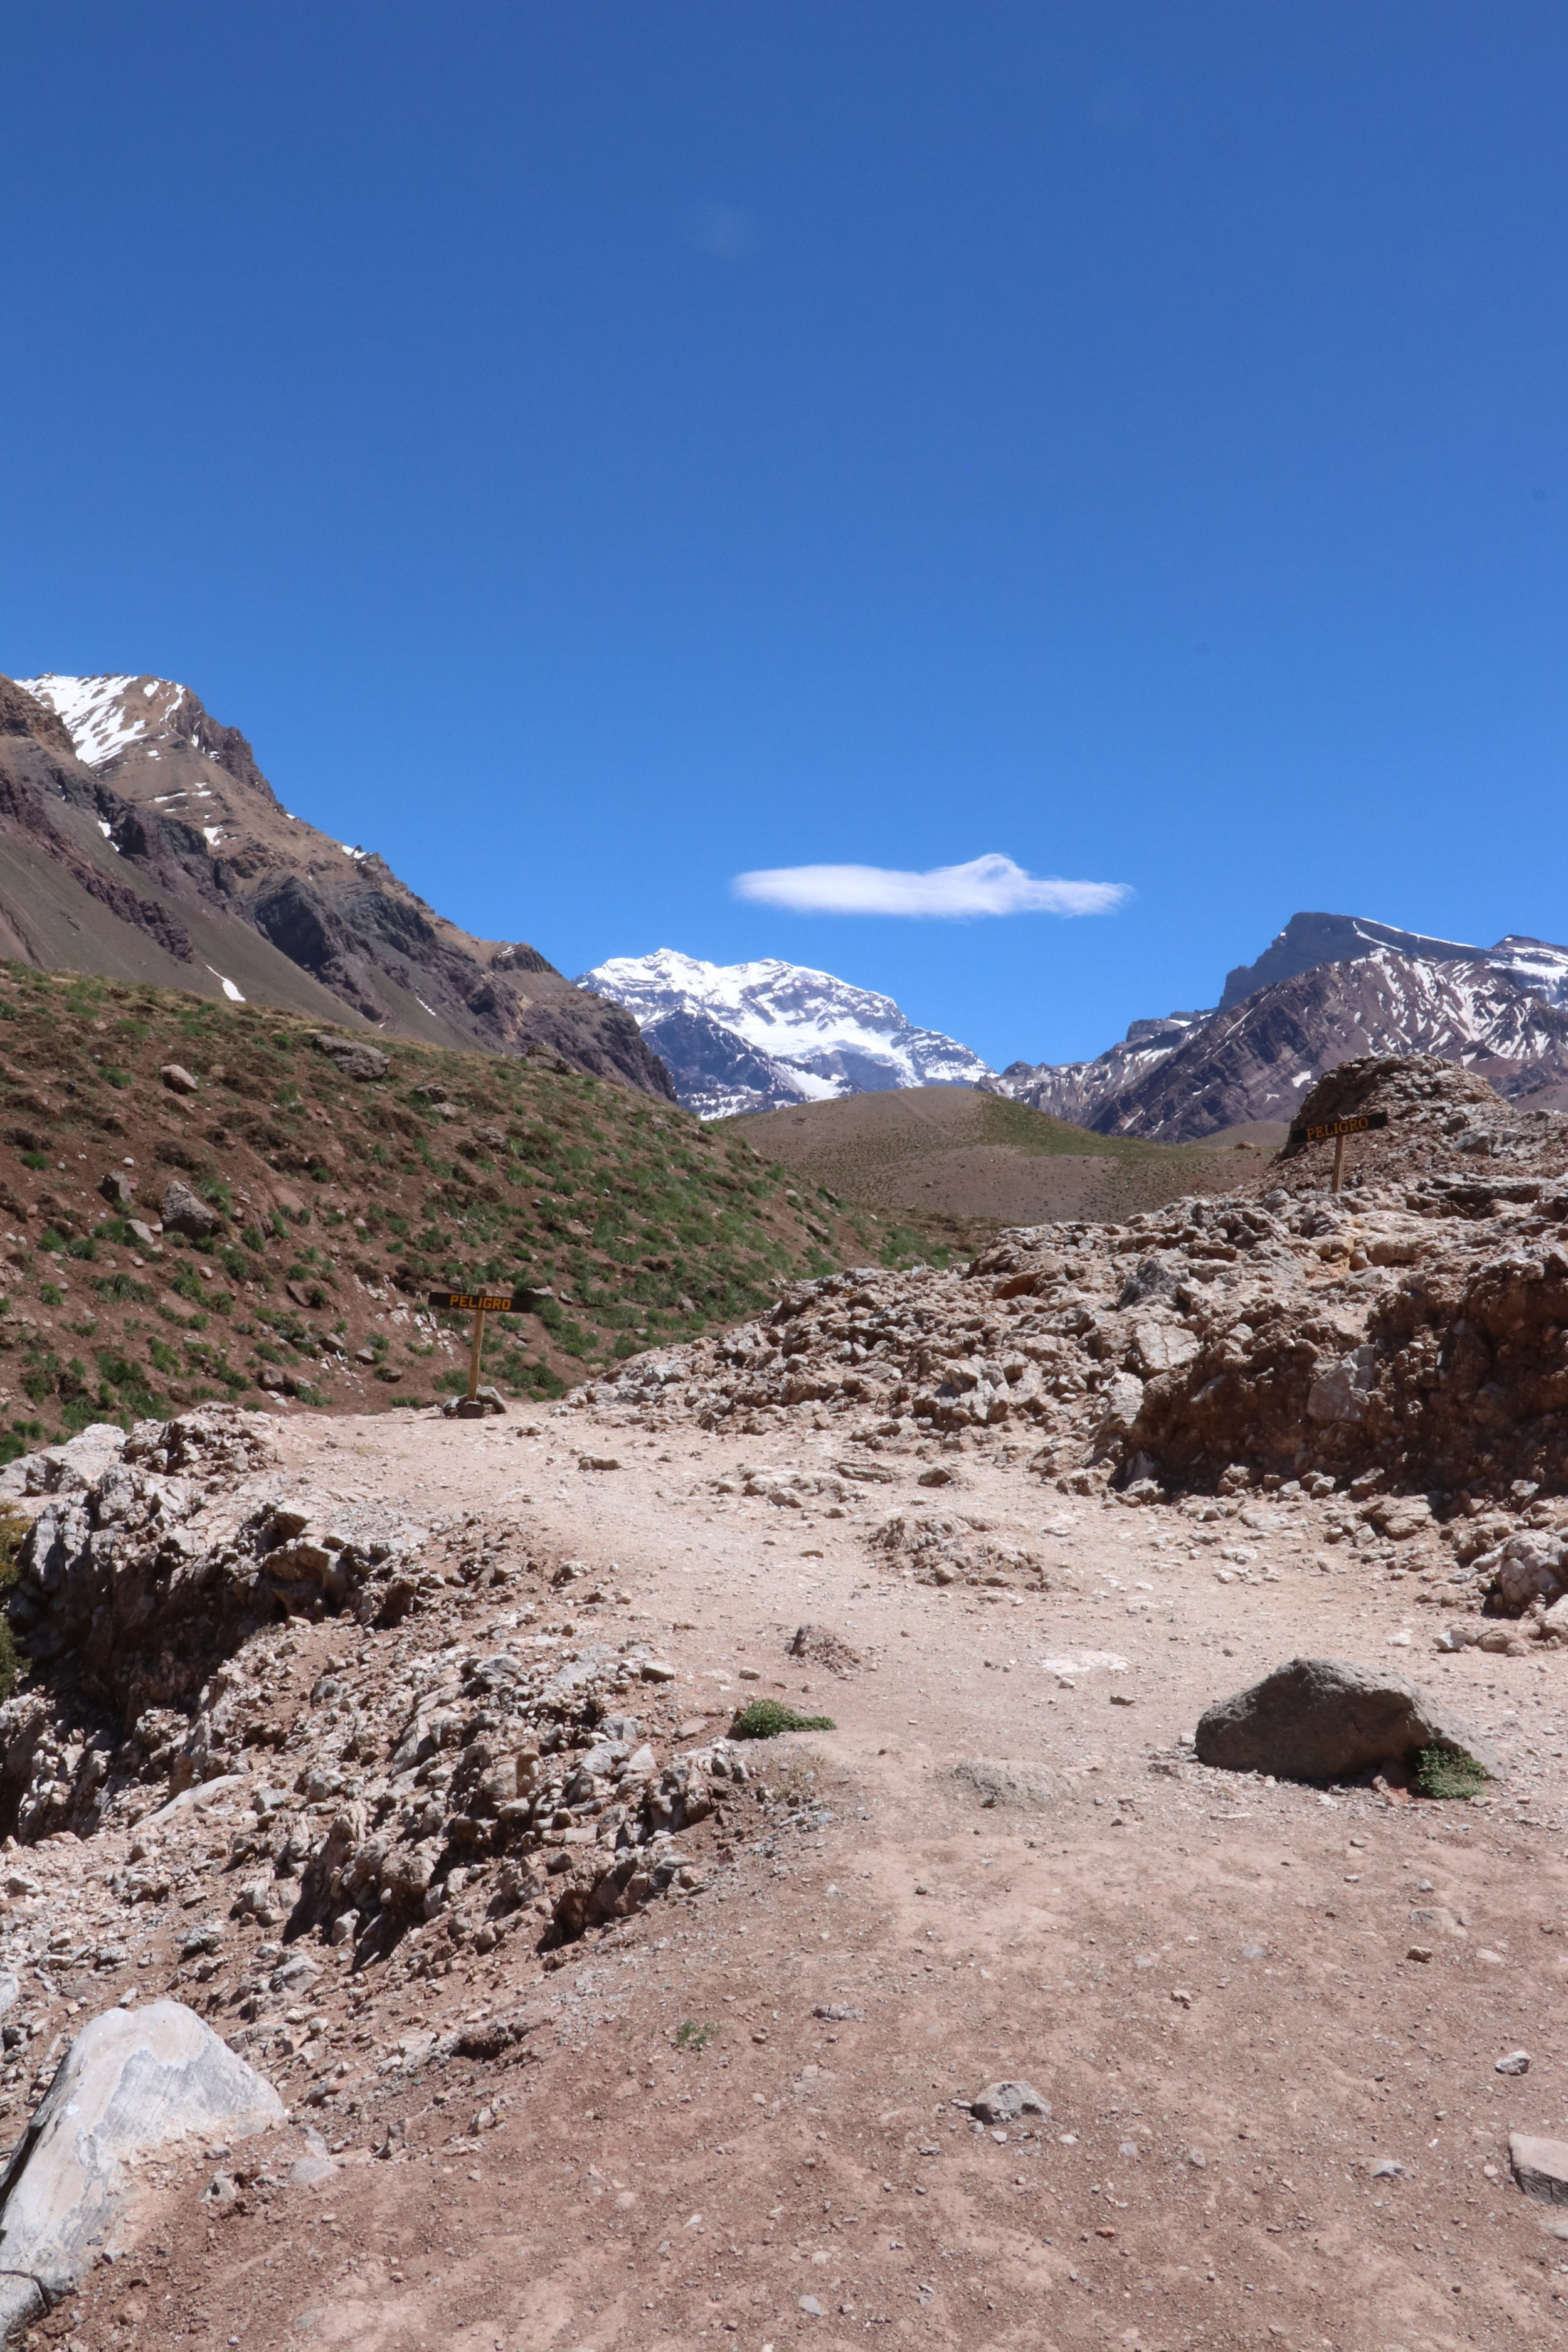 Acongagua, South America's tallest peak